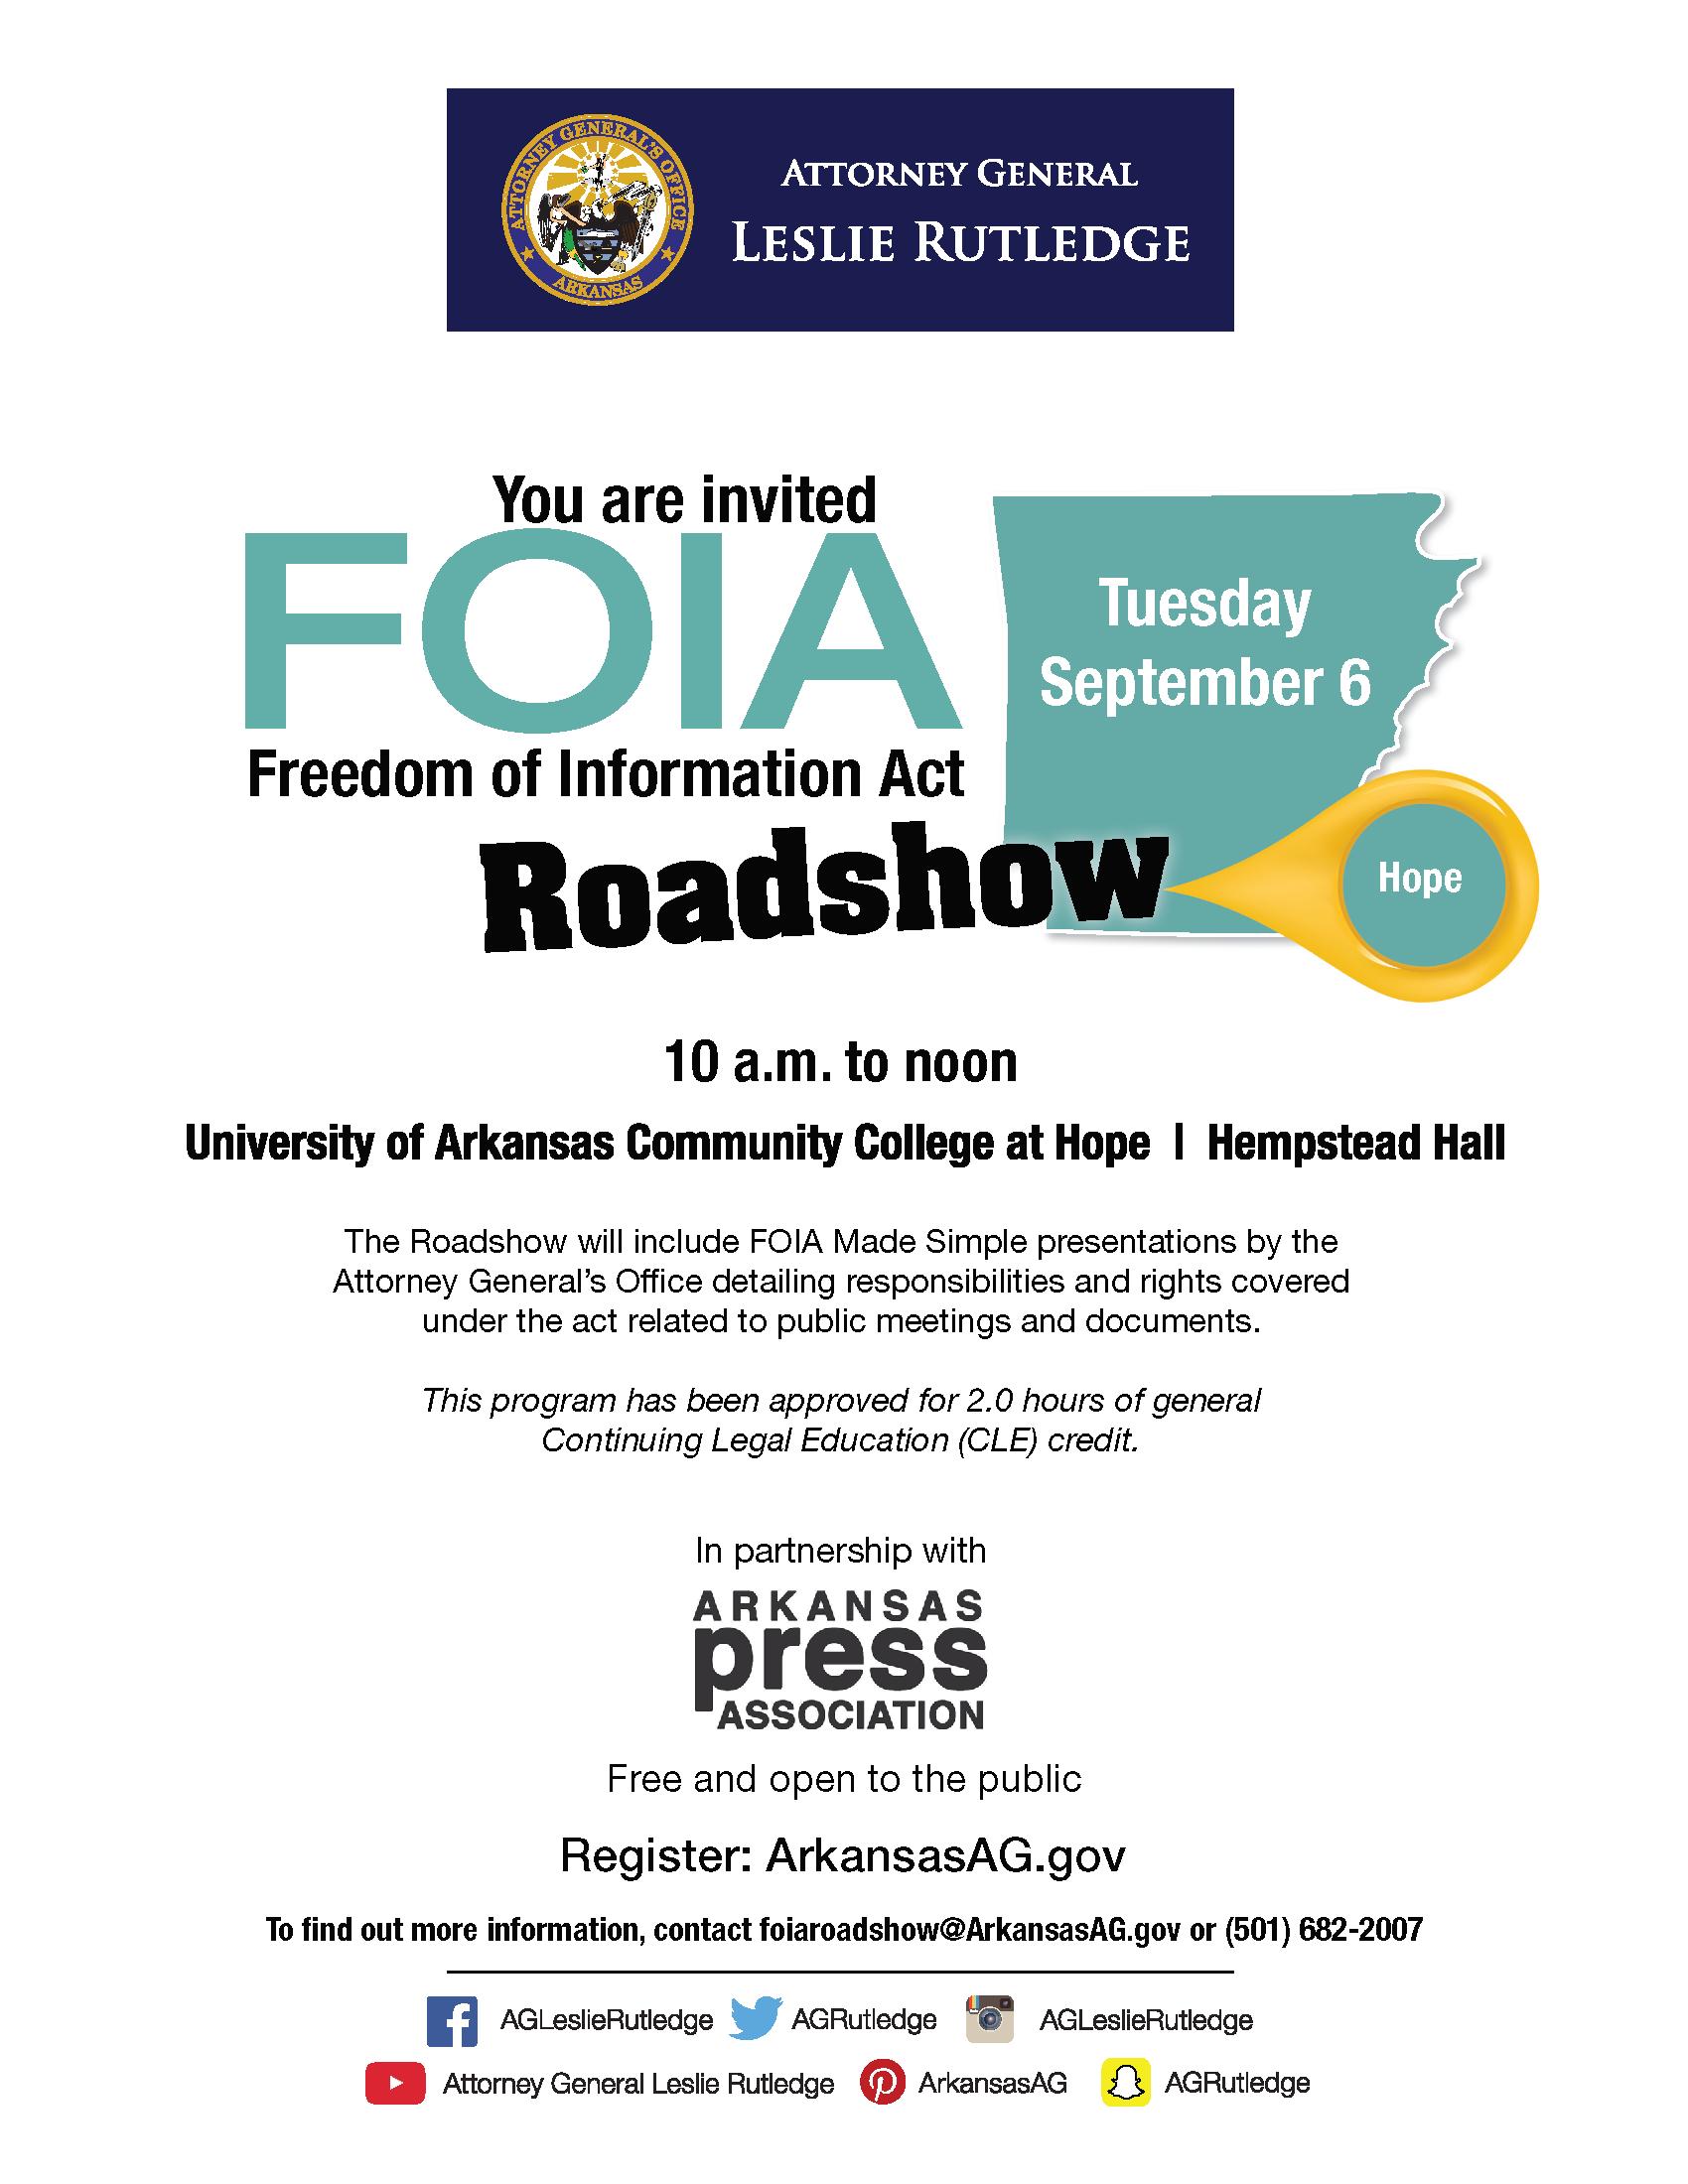 FOIA Roadshow flier IMAGE_Hope 2-29-16 (2)